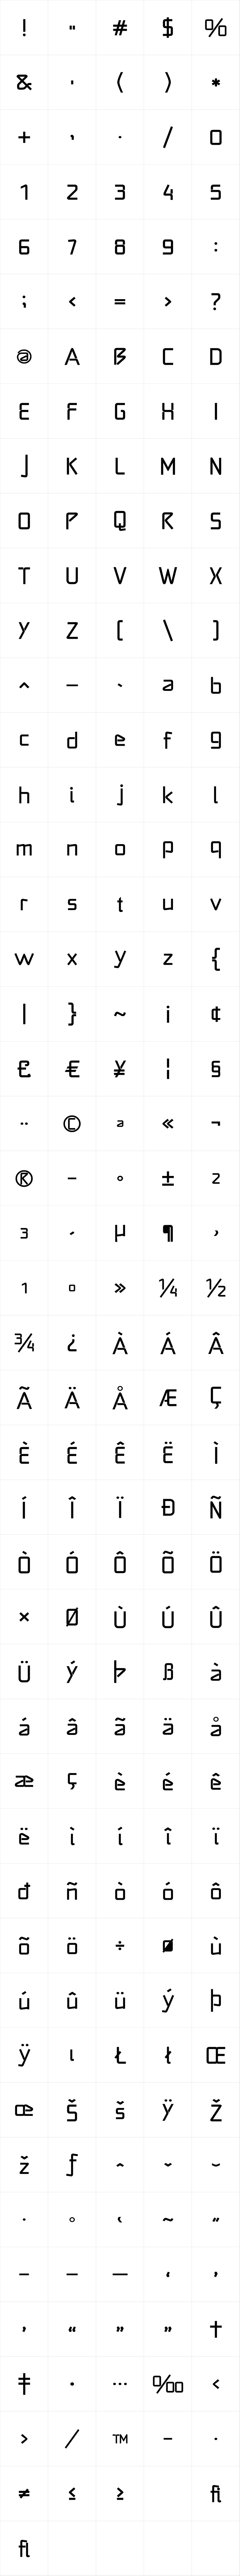 Alpha Delta Bold